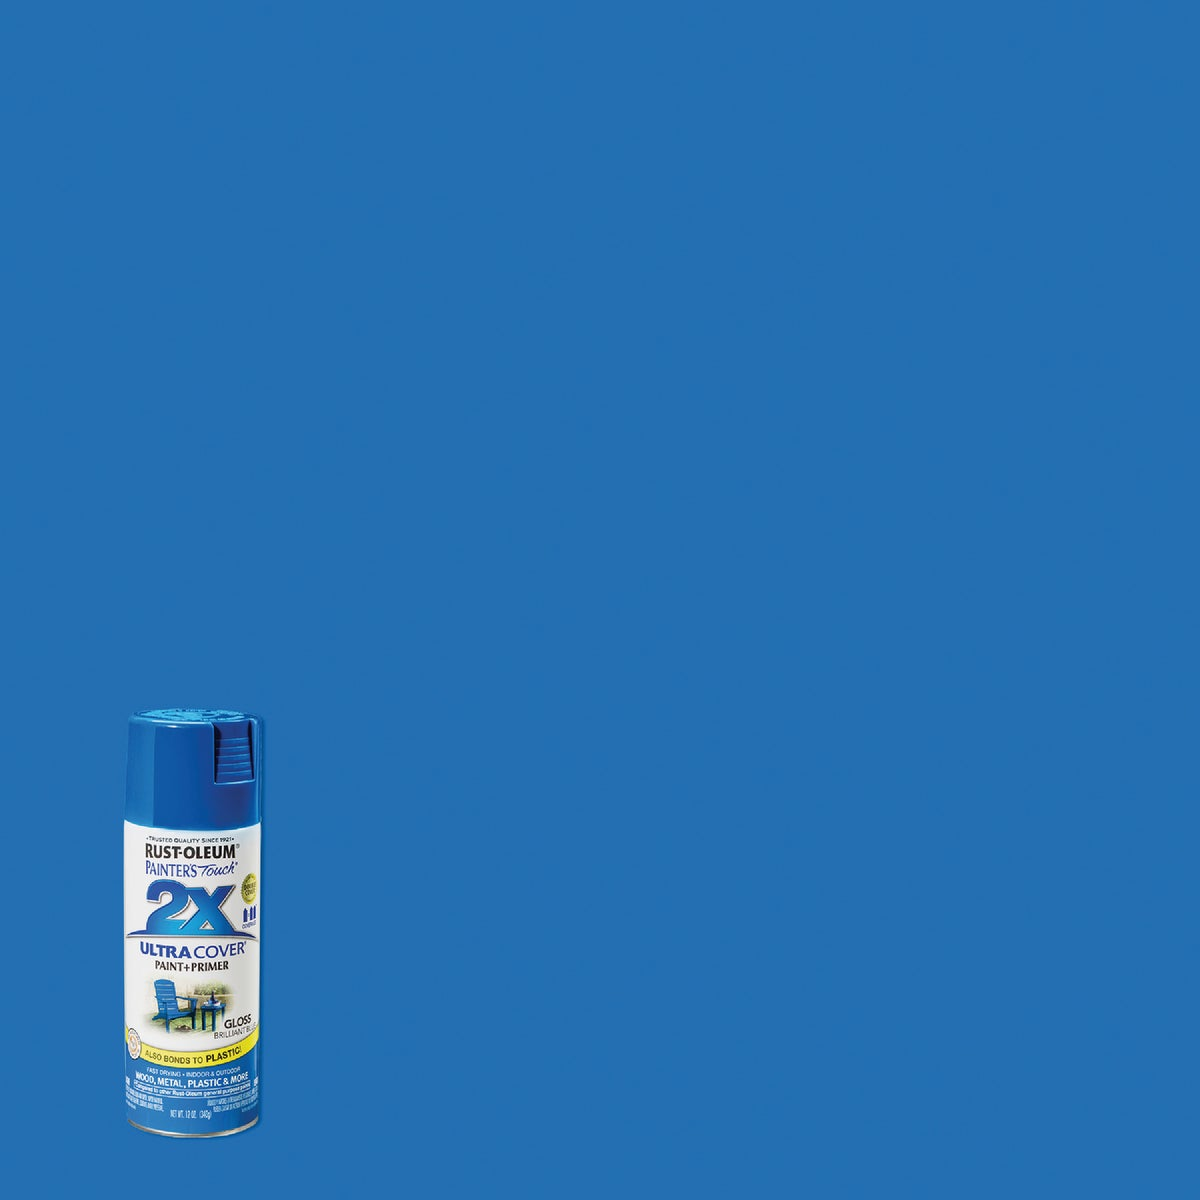 BRLIANT BLUE SPRAY PAINT - 249120 by Rustoleum